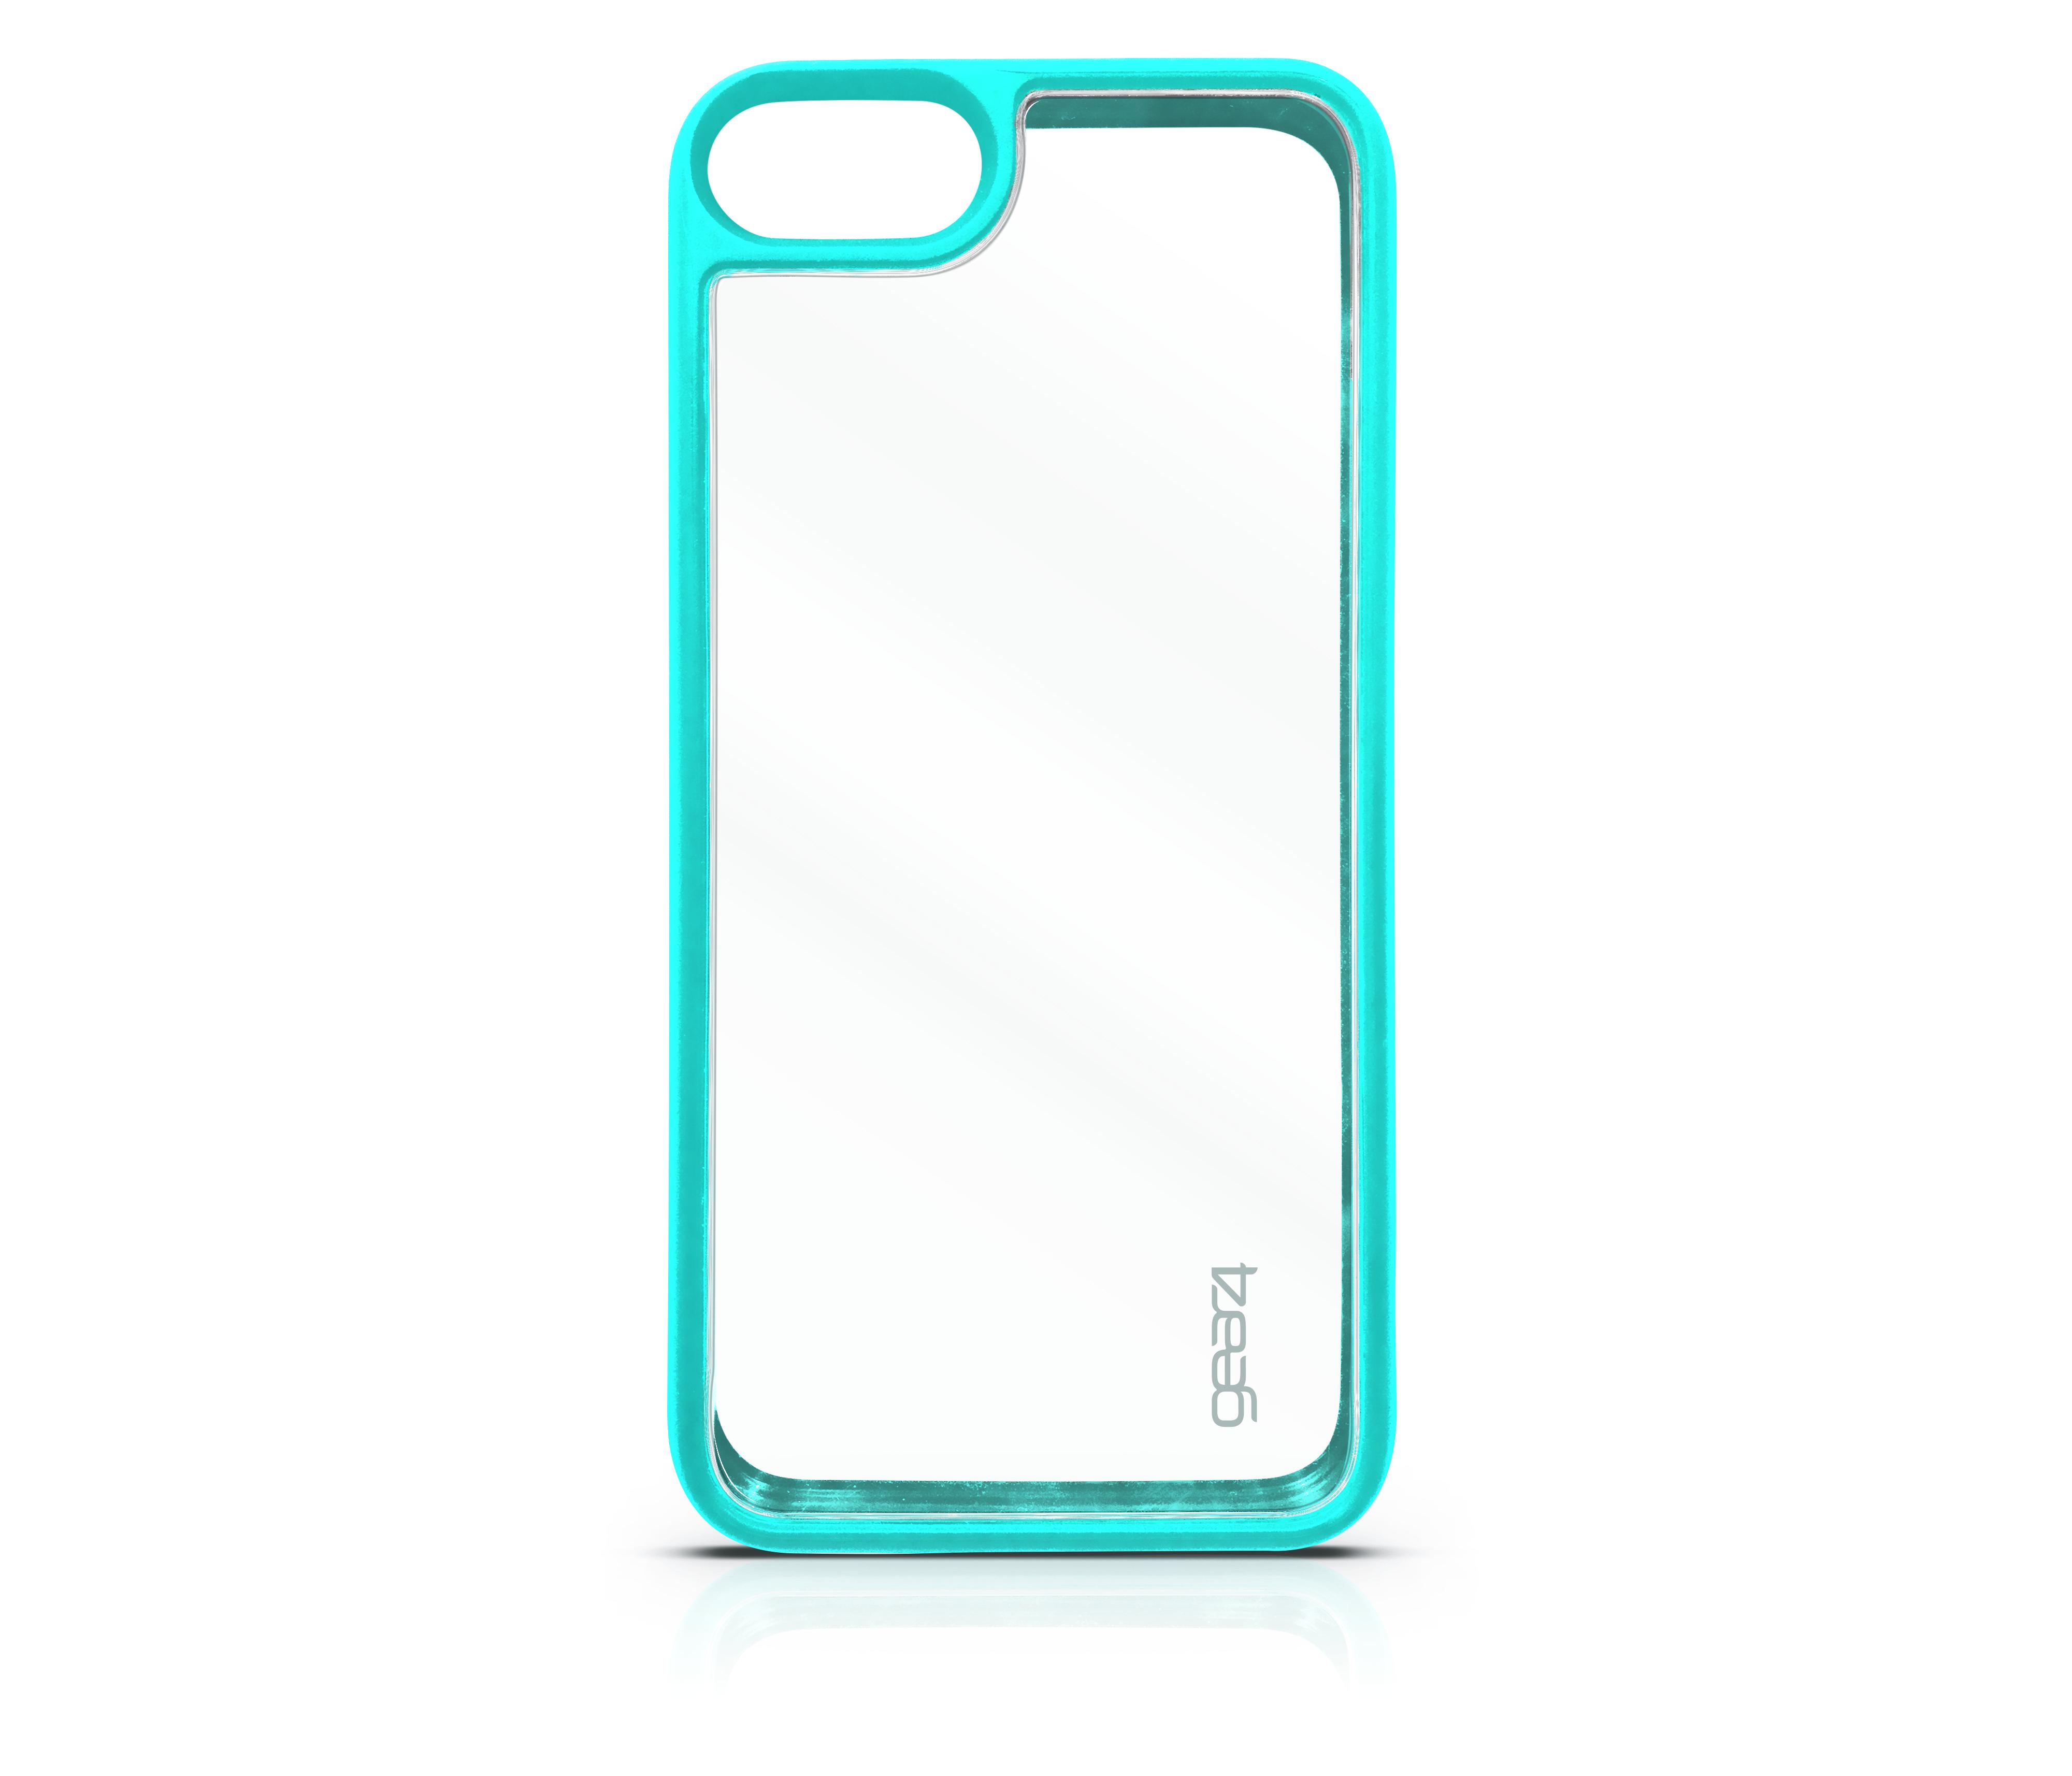 Coque Gear4 iPhone 5C bleu